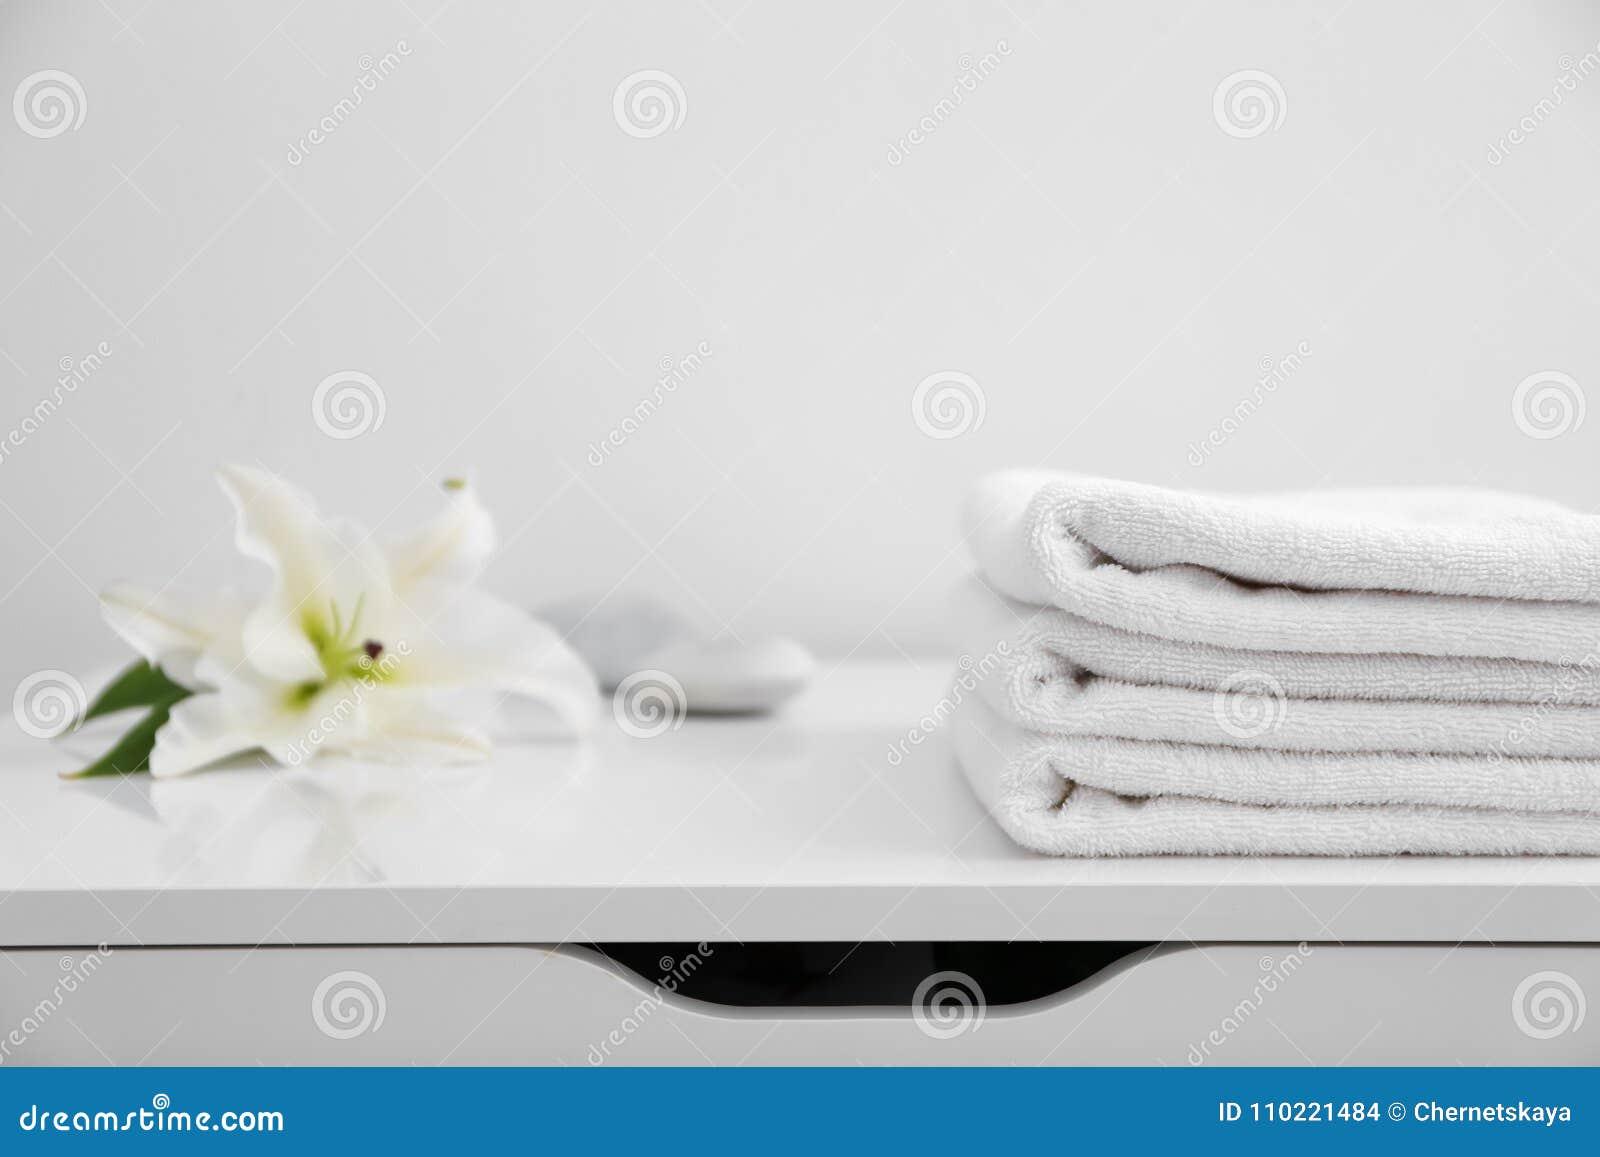 Pila de toallas limpias